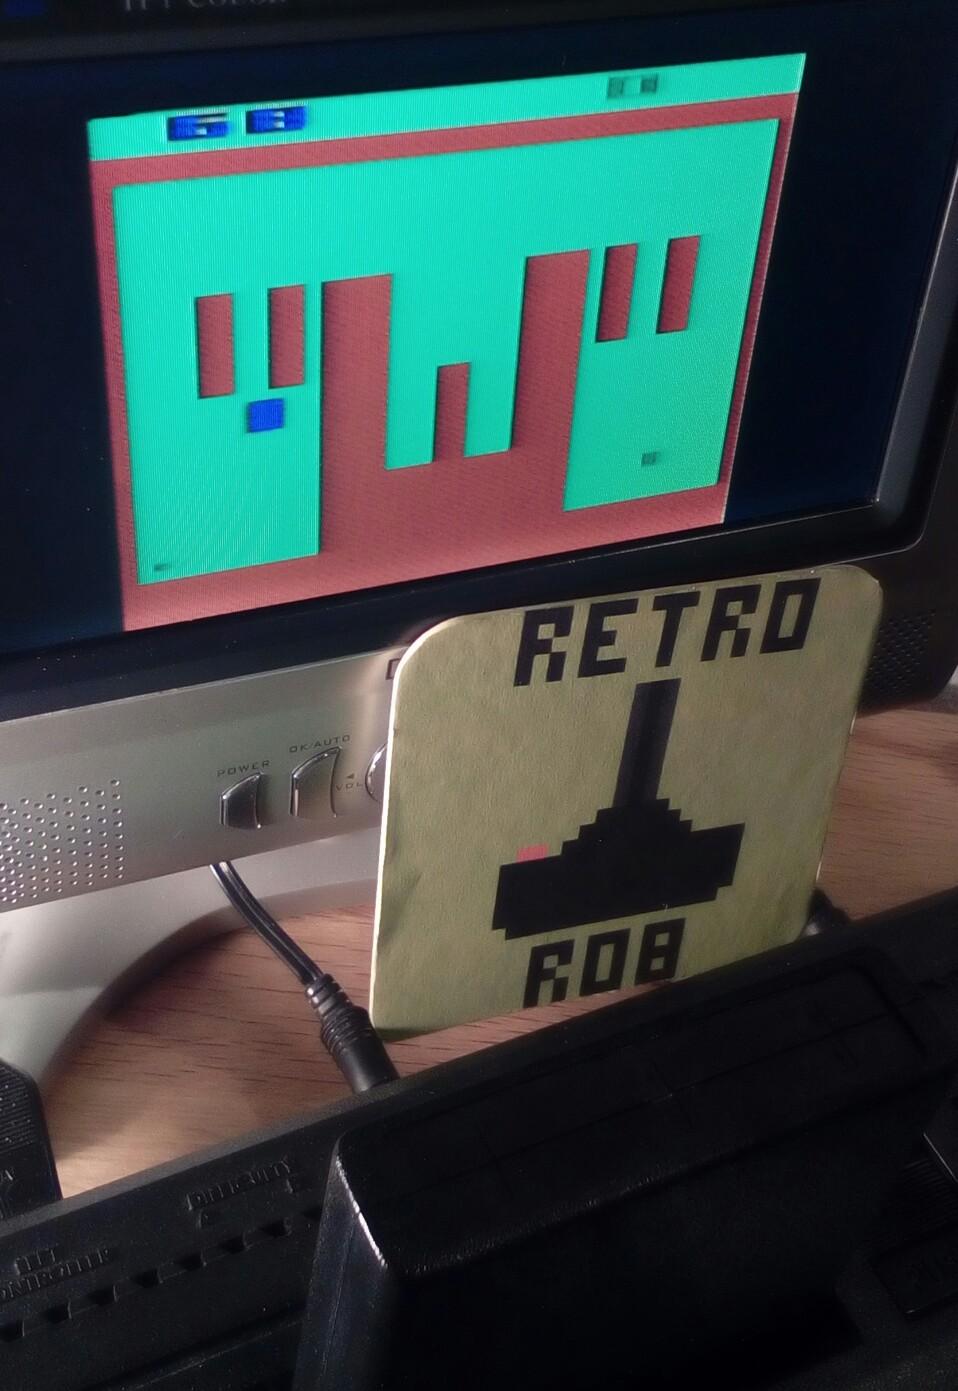 RetroRob: Miniature Golf (Atari 2600) 68 points on 2018-12-26 16:08:37